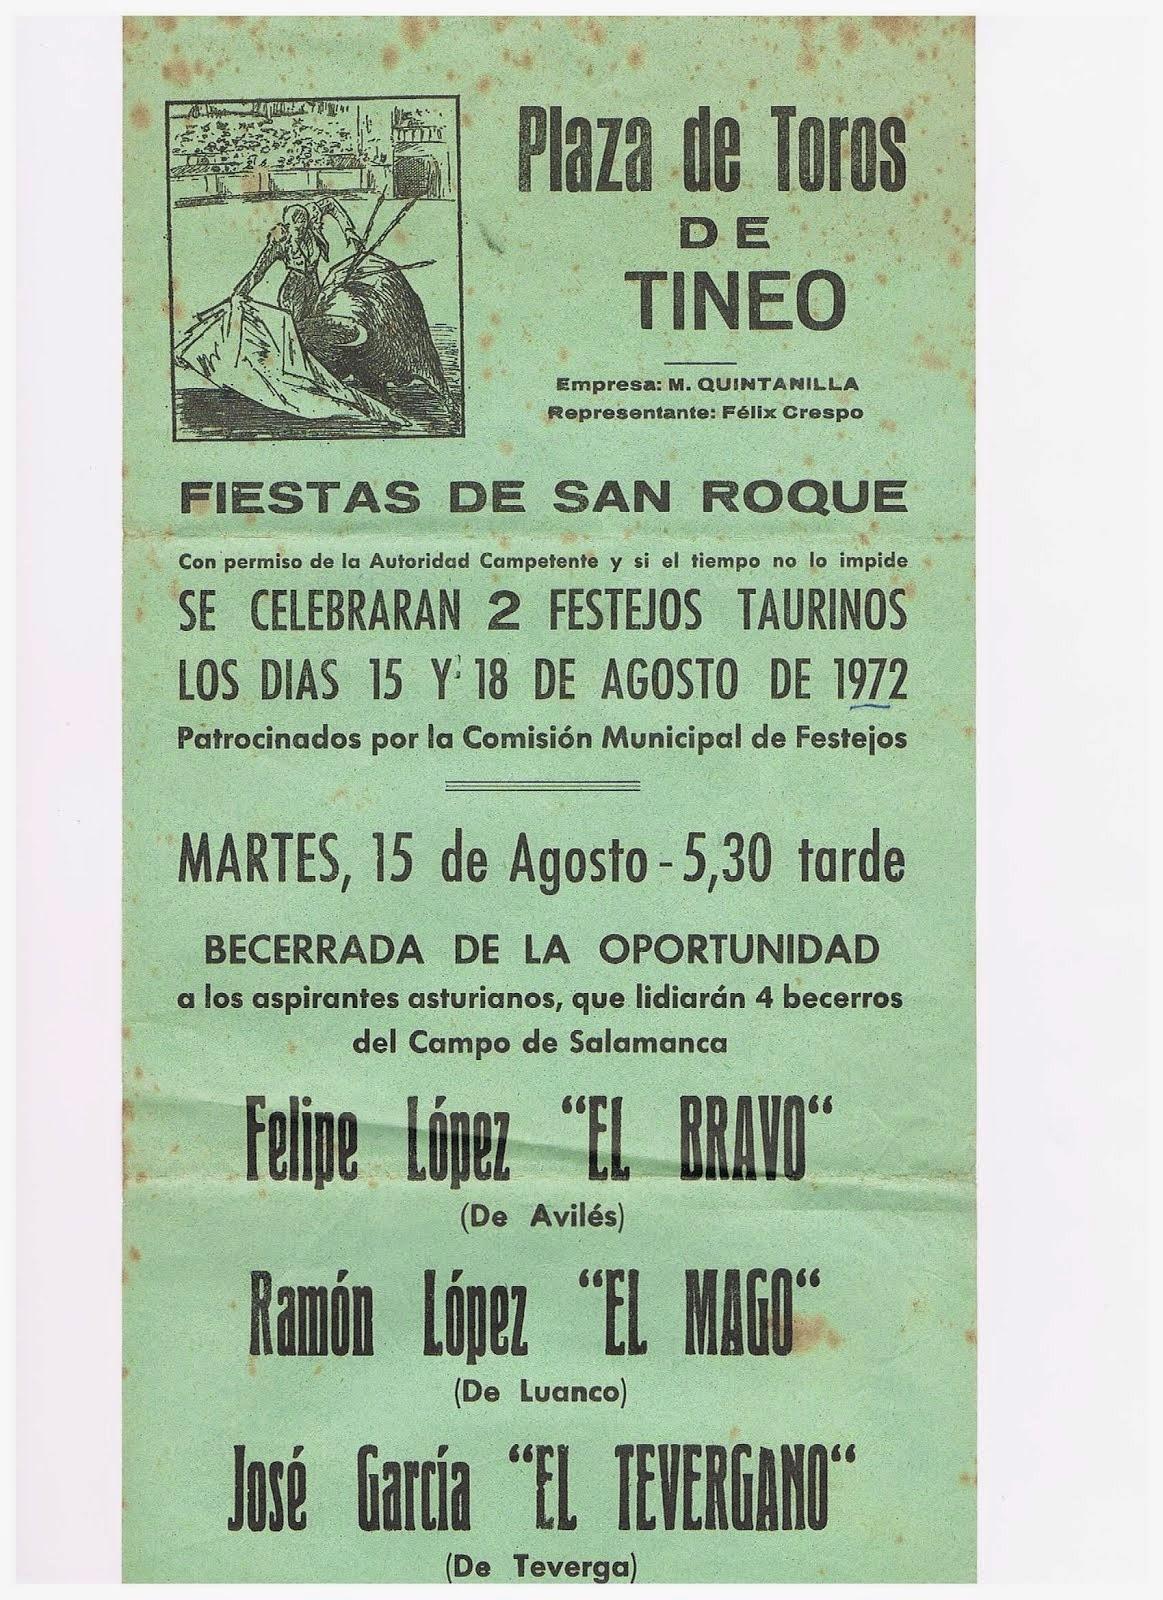 CARTEL DE TOROS DE TINEO